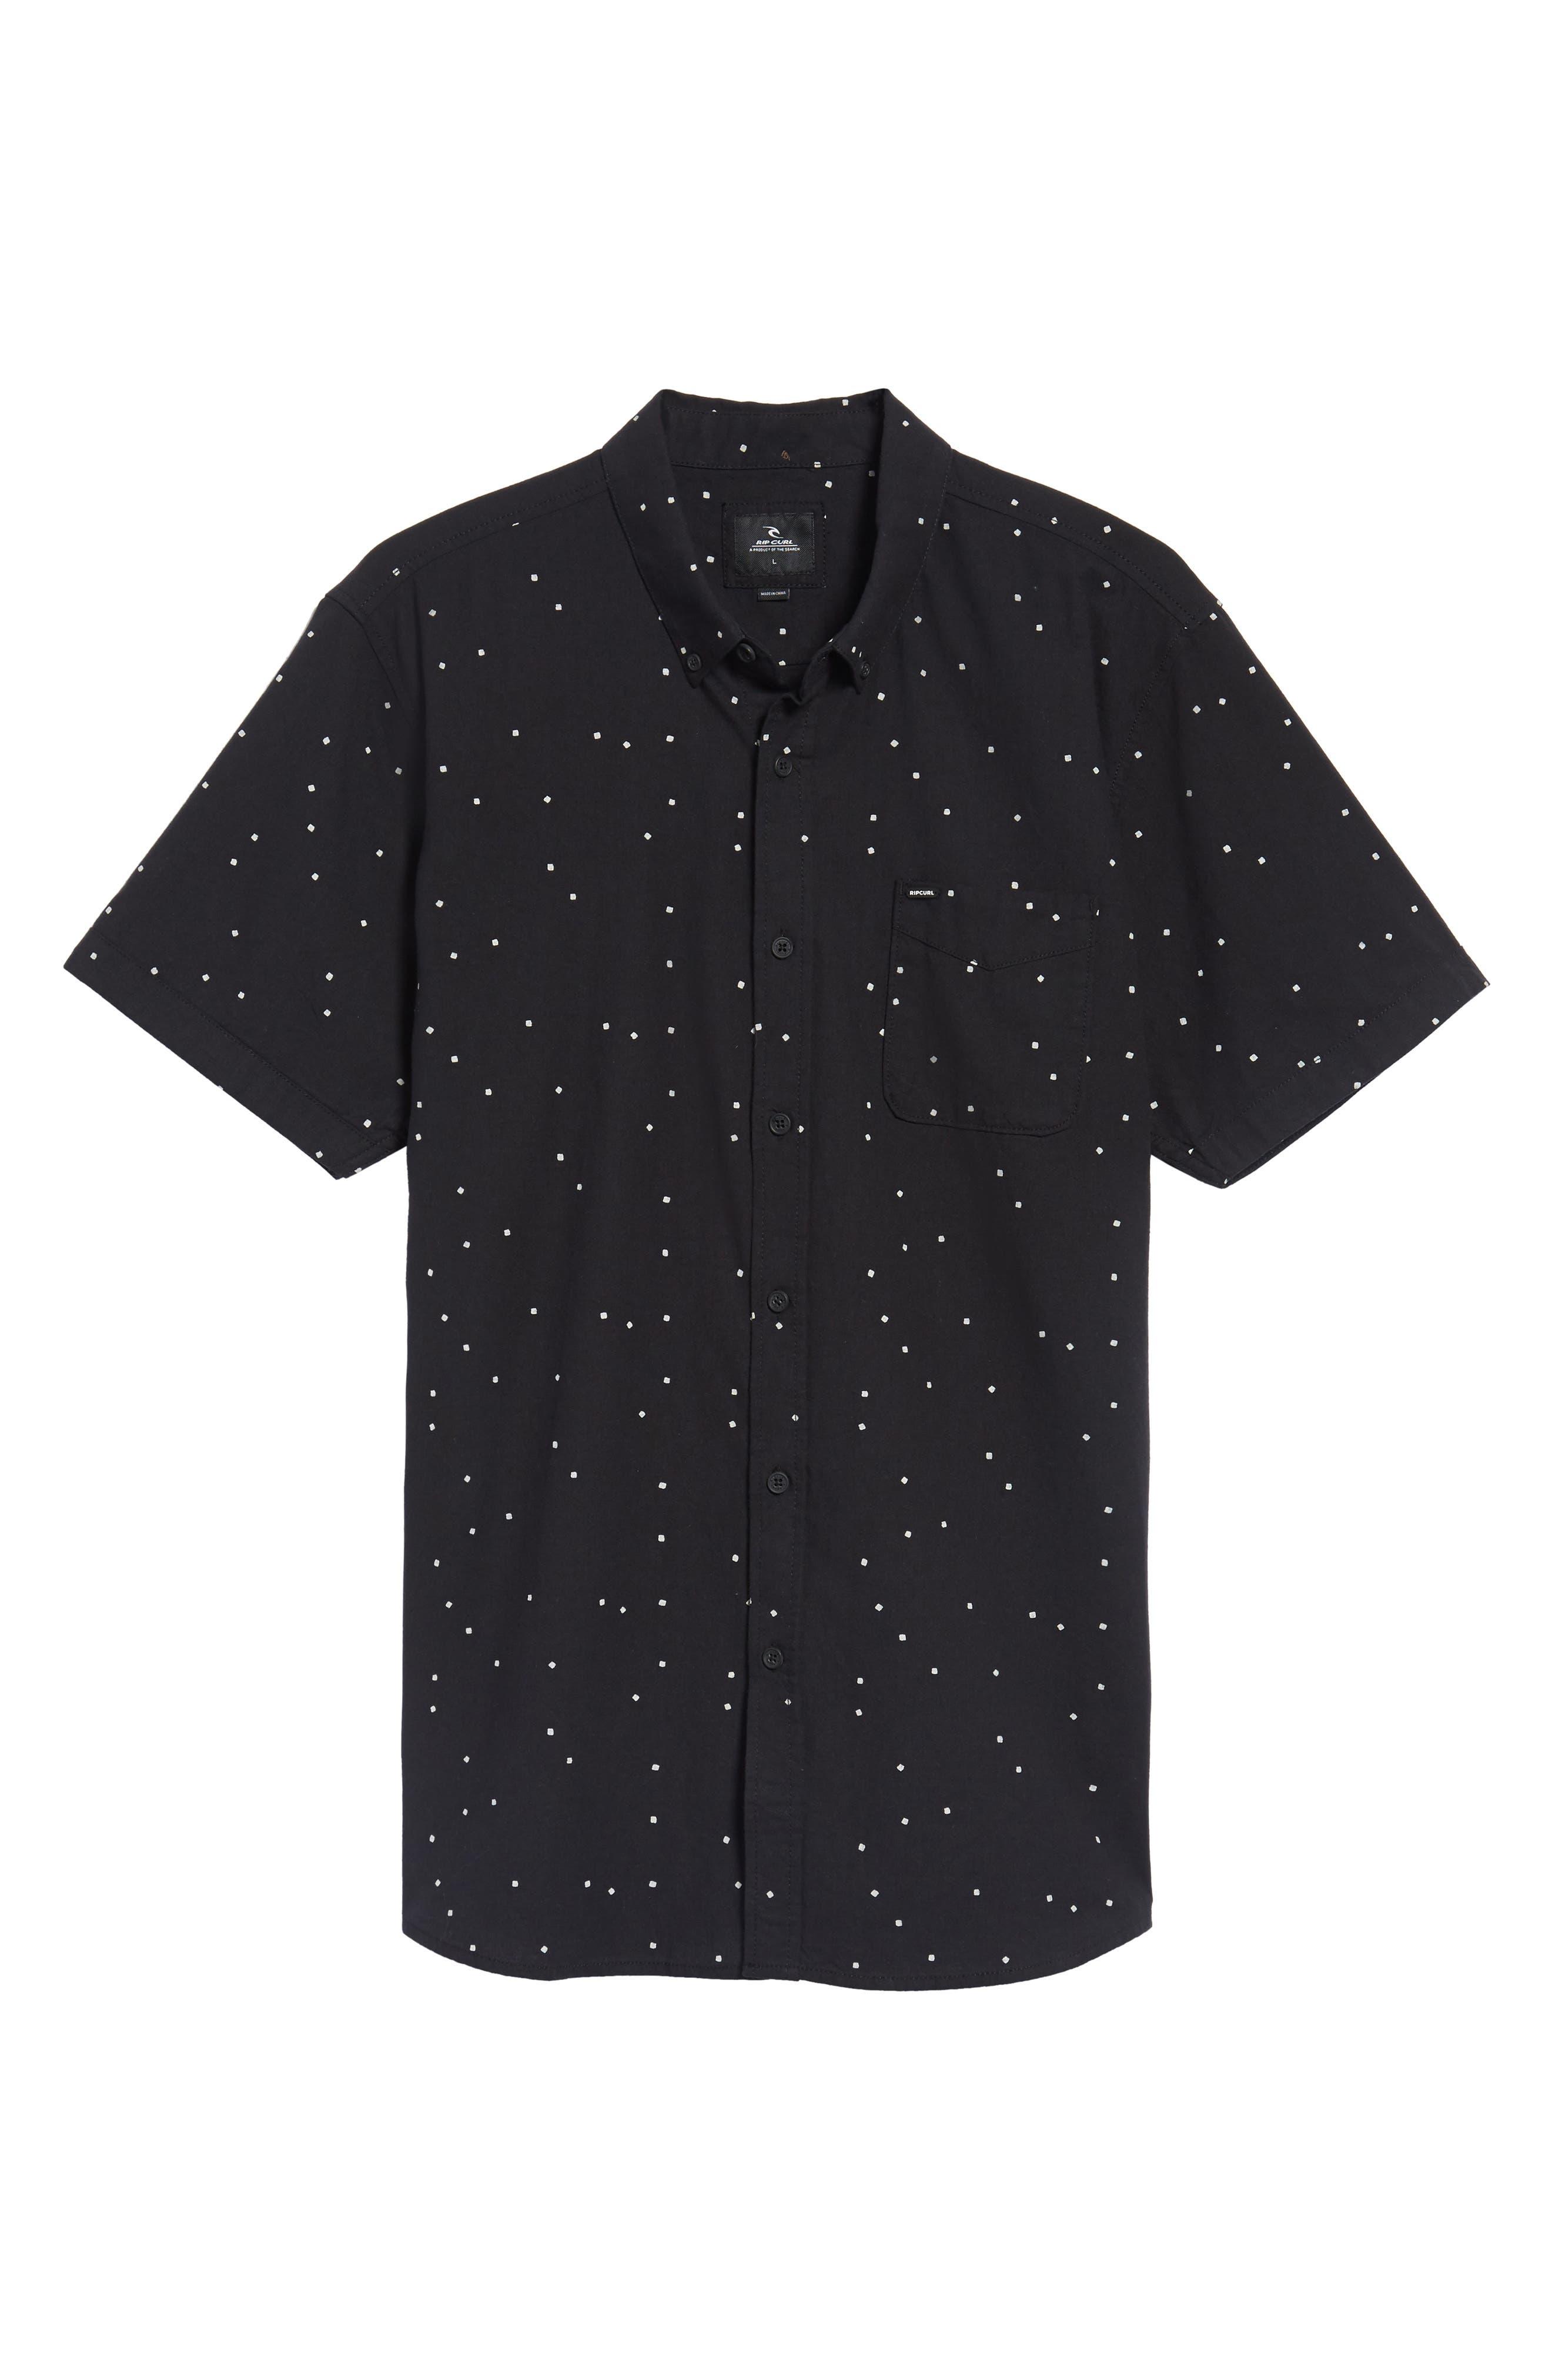 Mixter Short Sleeve Shirt,                             Alternate thumbnail 6, color,                             001